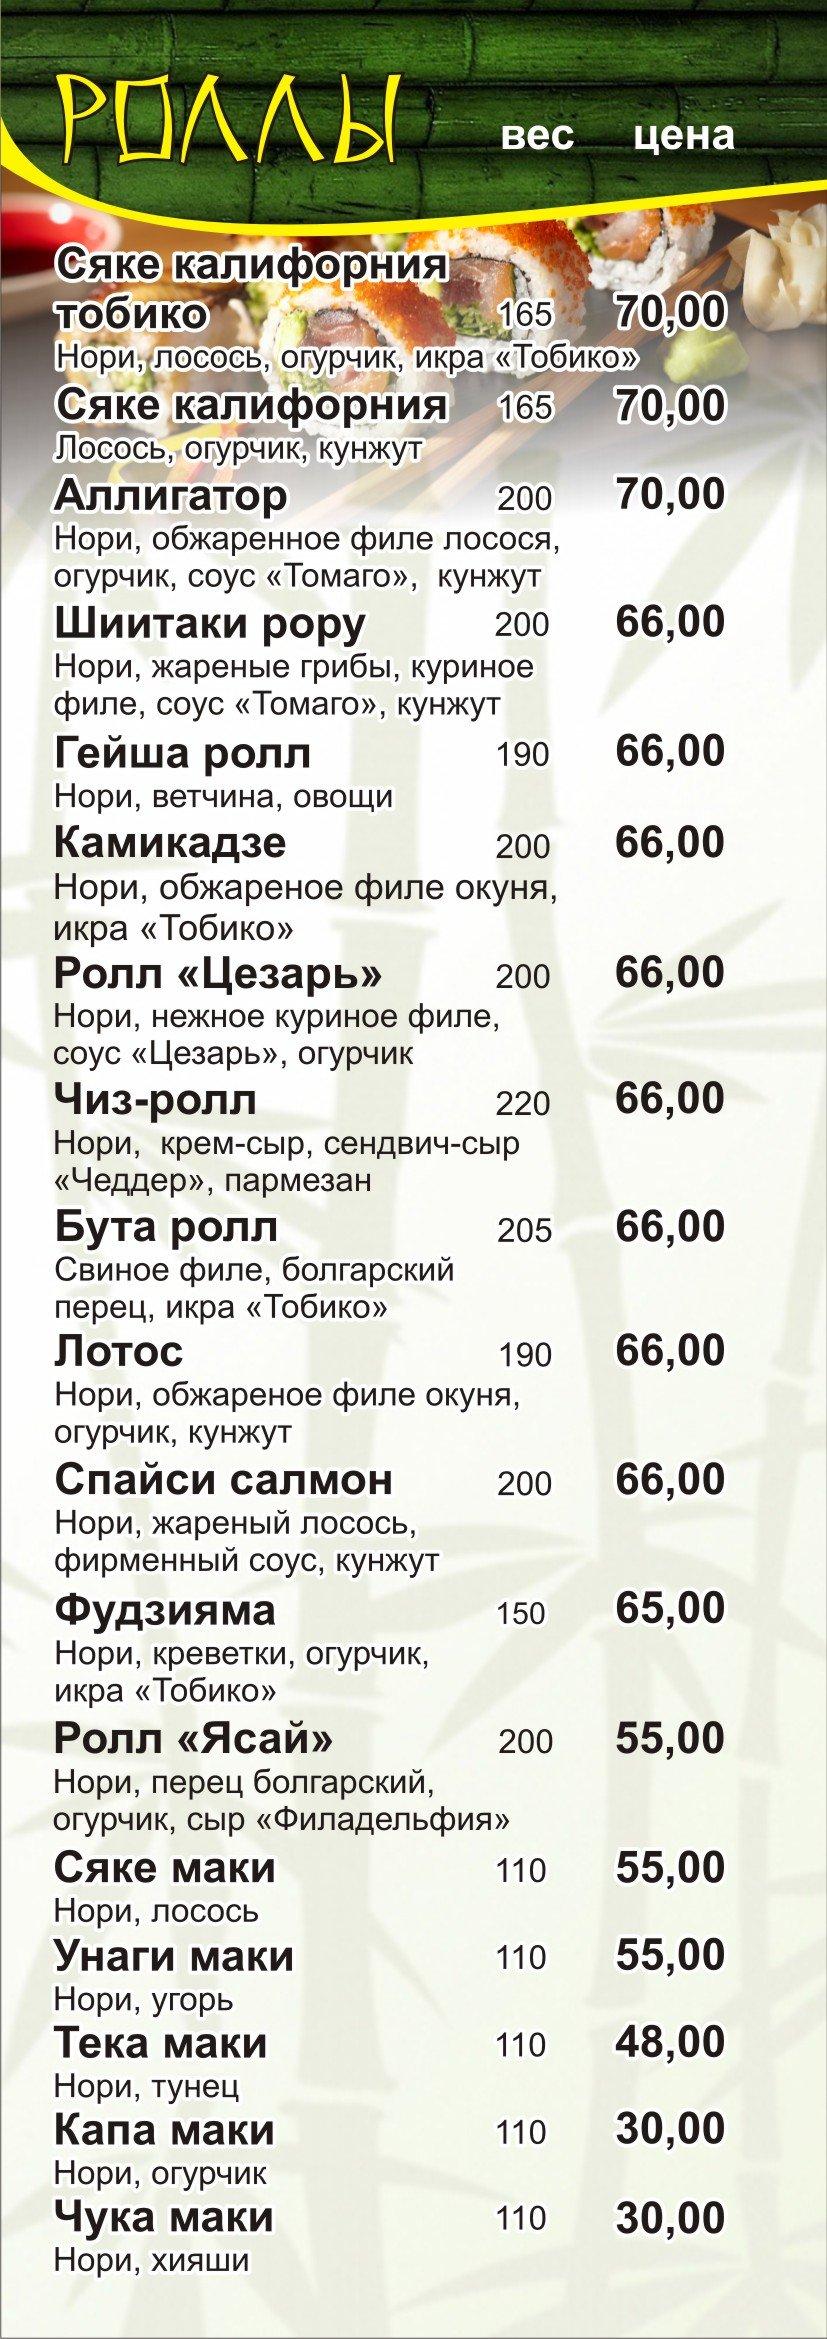 "Суши бесплатно! Праздничное предложение от кафе ""Панда - пицца, роллы"", фото-2"